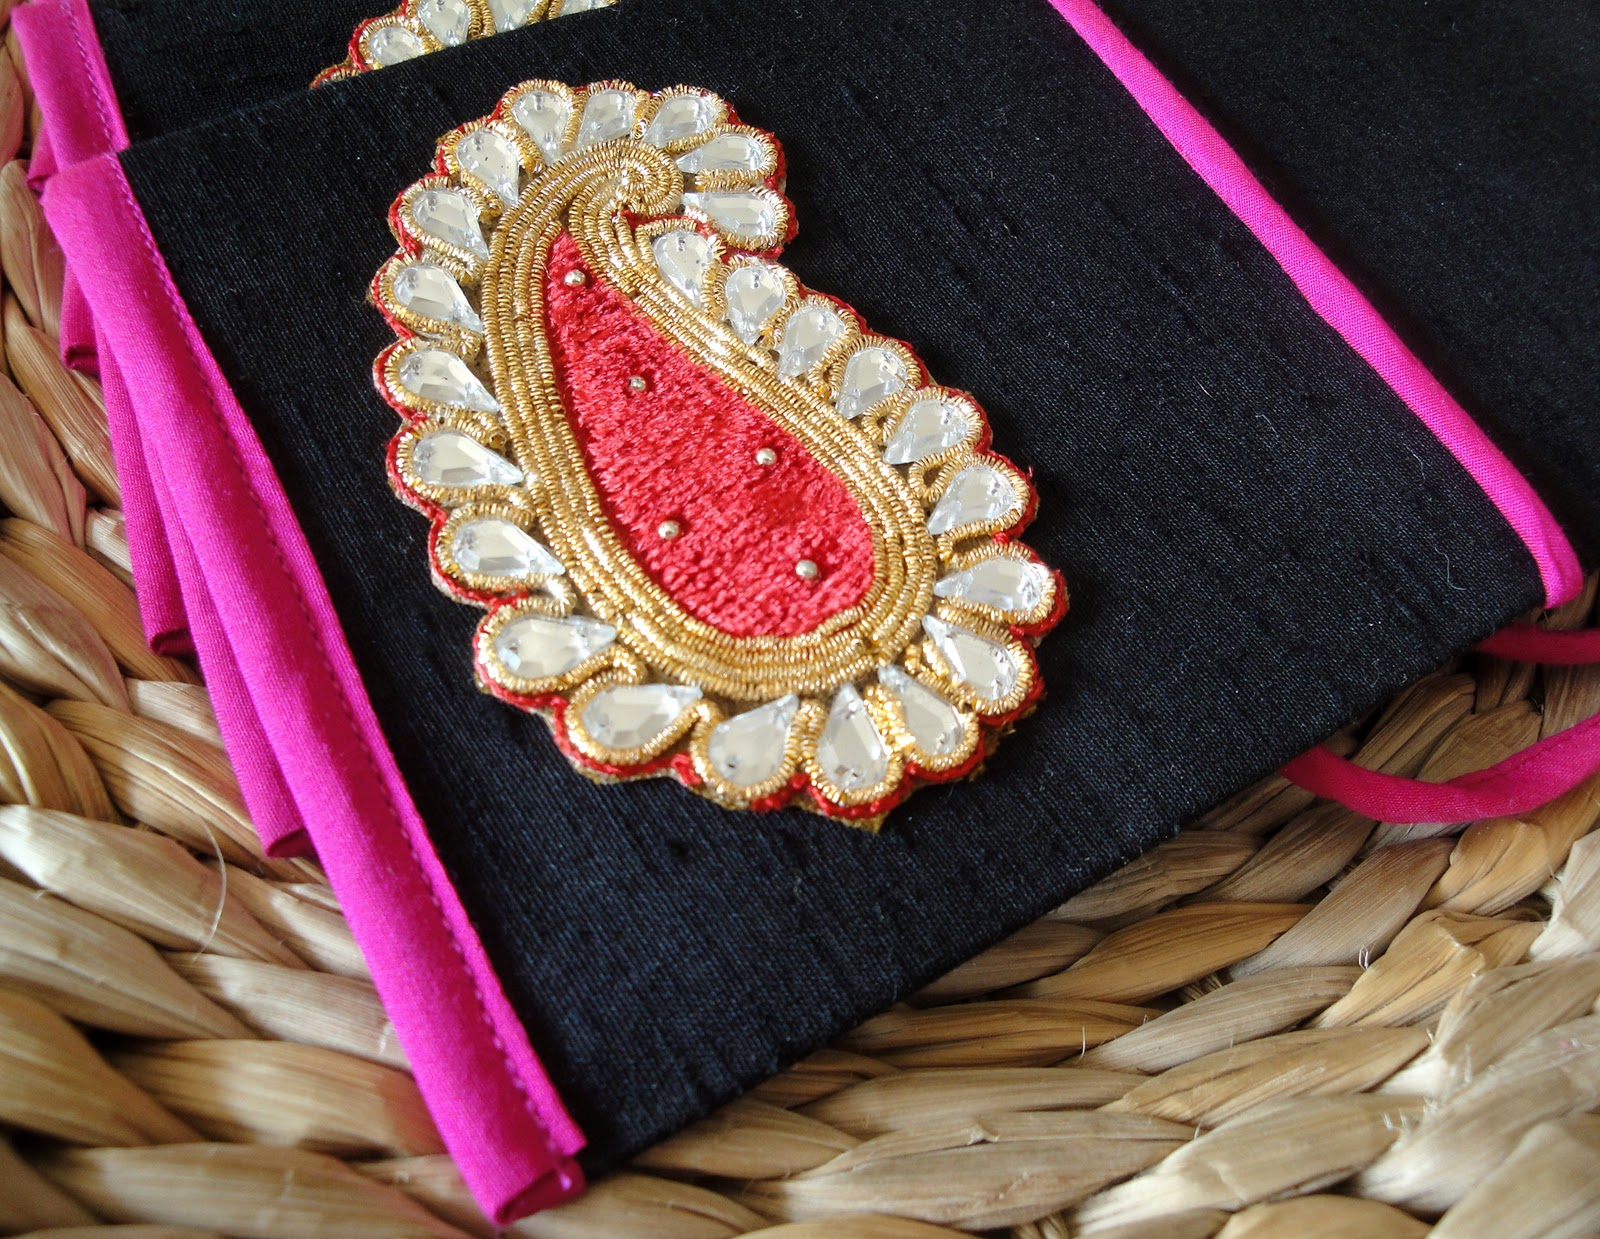 Indian Wedding Gift Envelopes : ... Gift Envelopes for weddings....these went to Abu Dhabi yayayayyaya